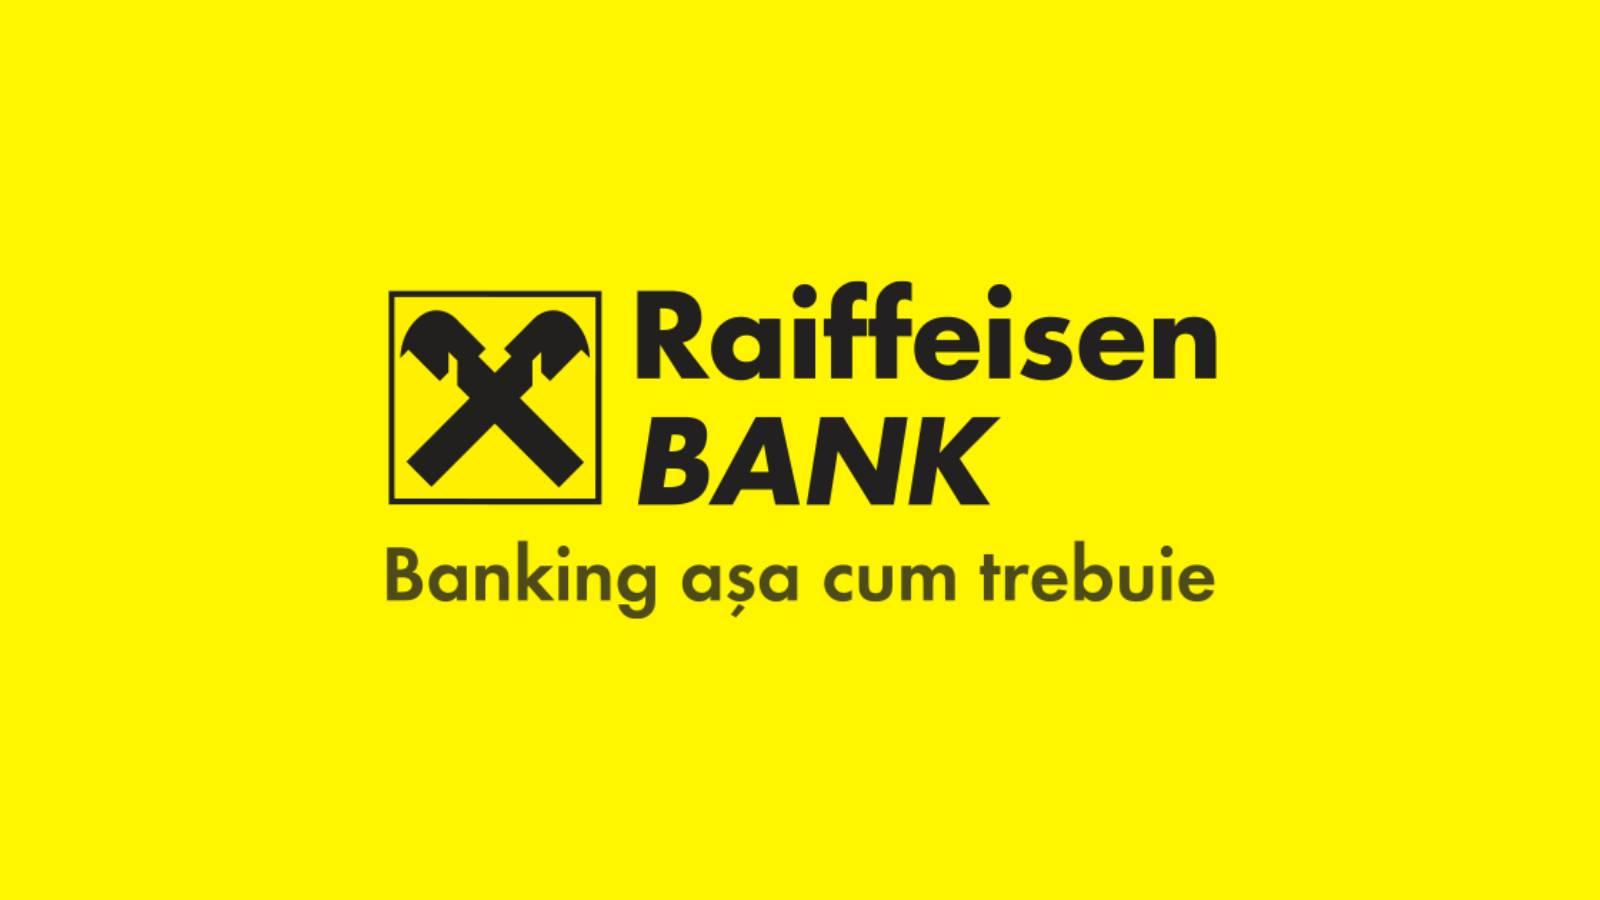 Raiffeisen Bank western